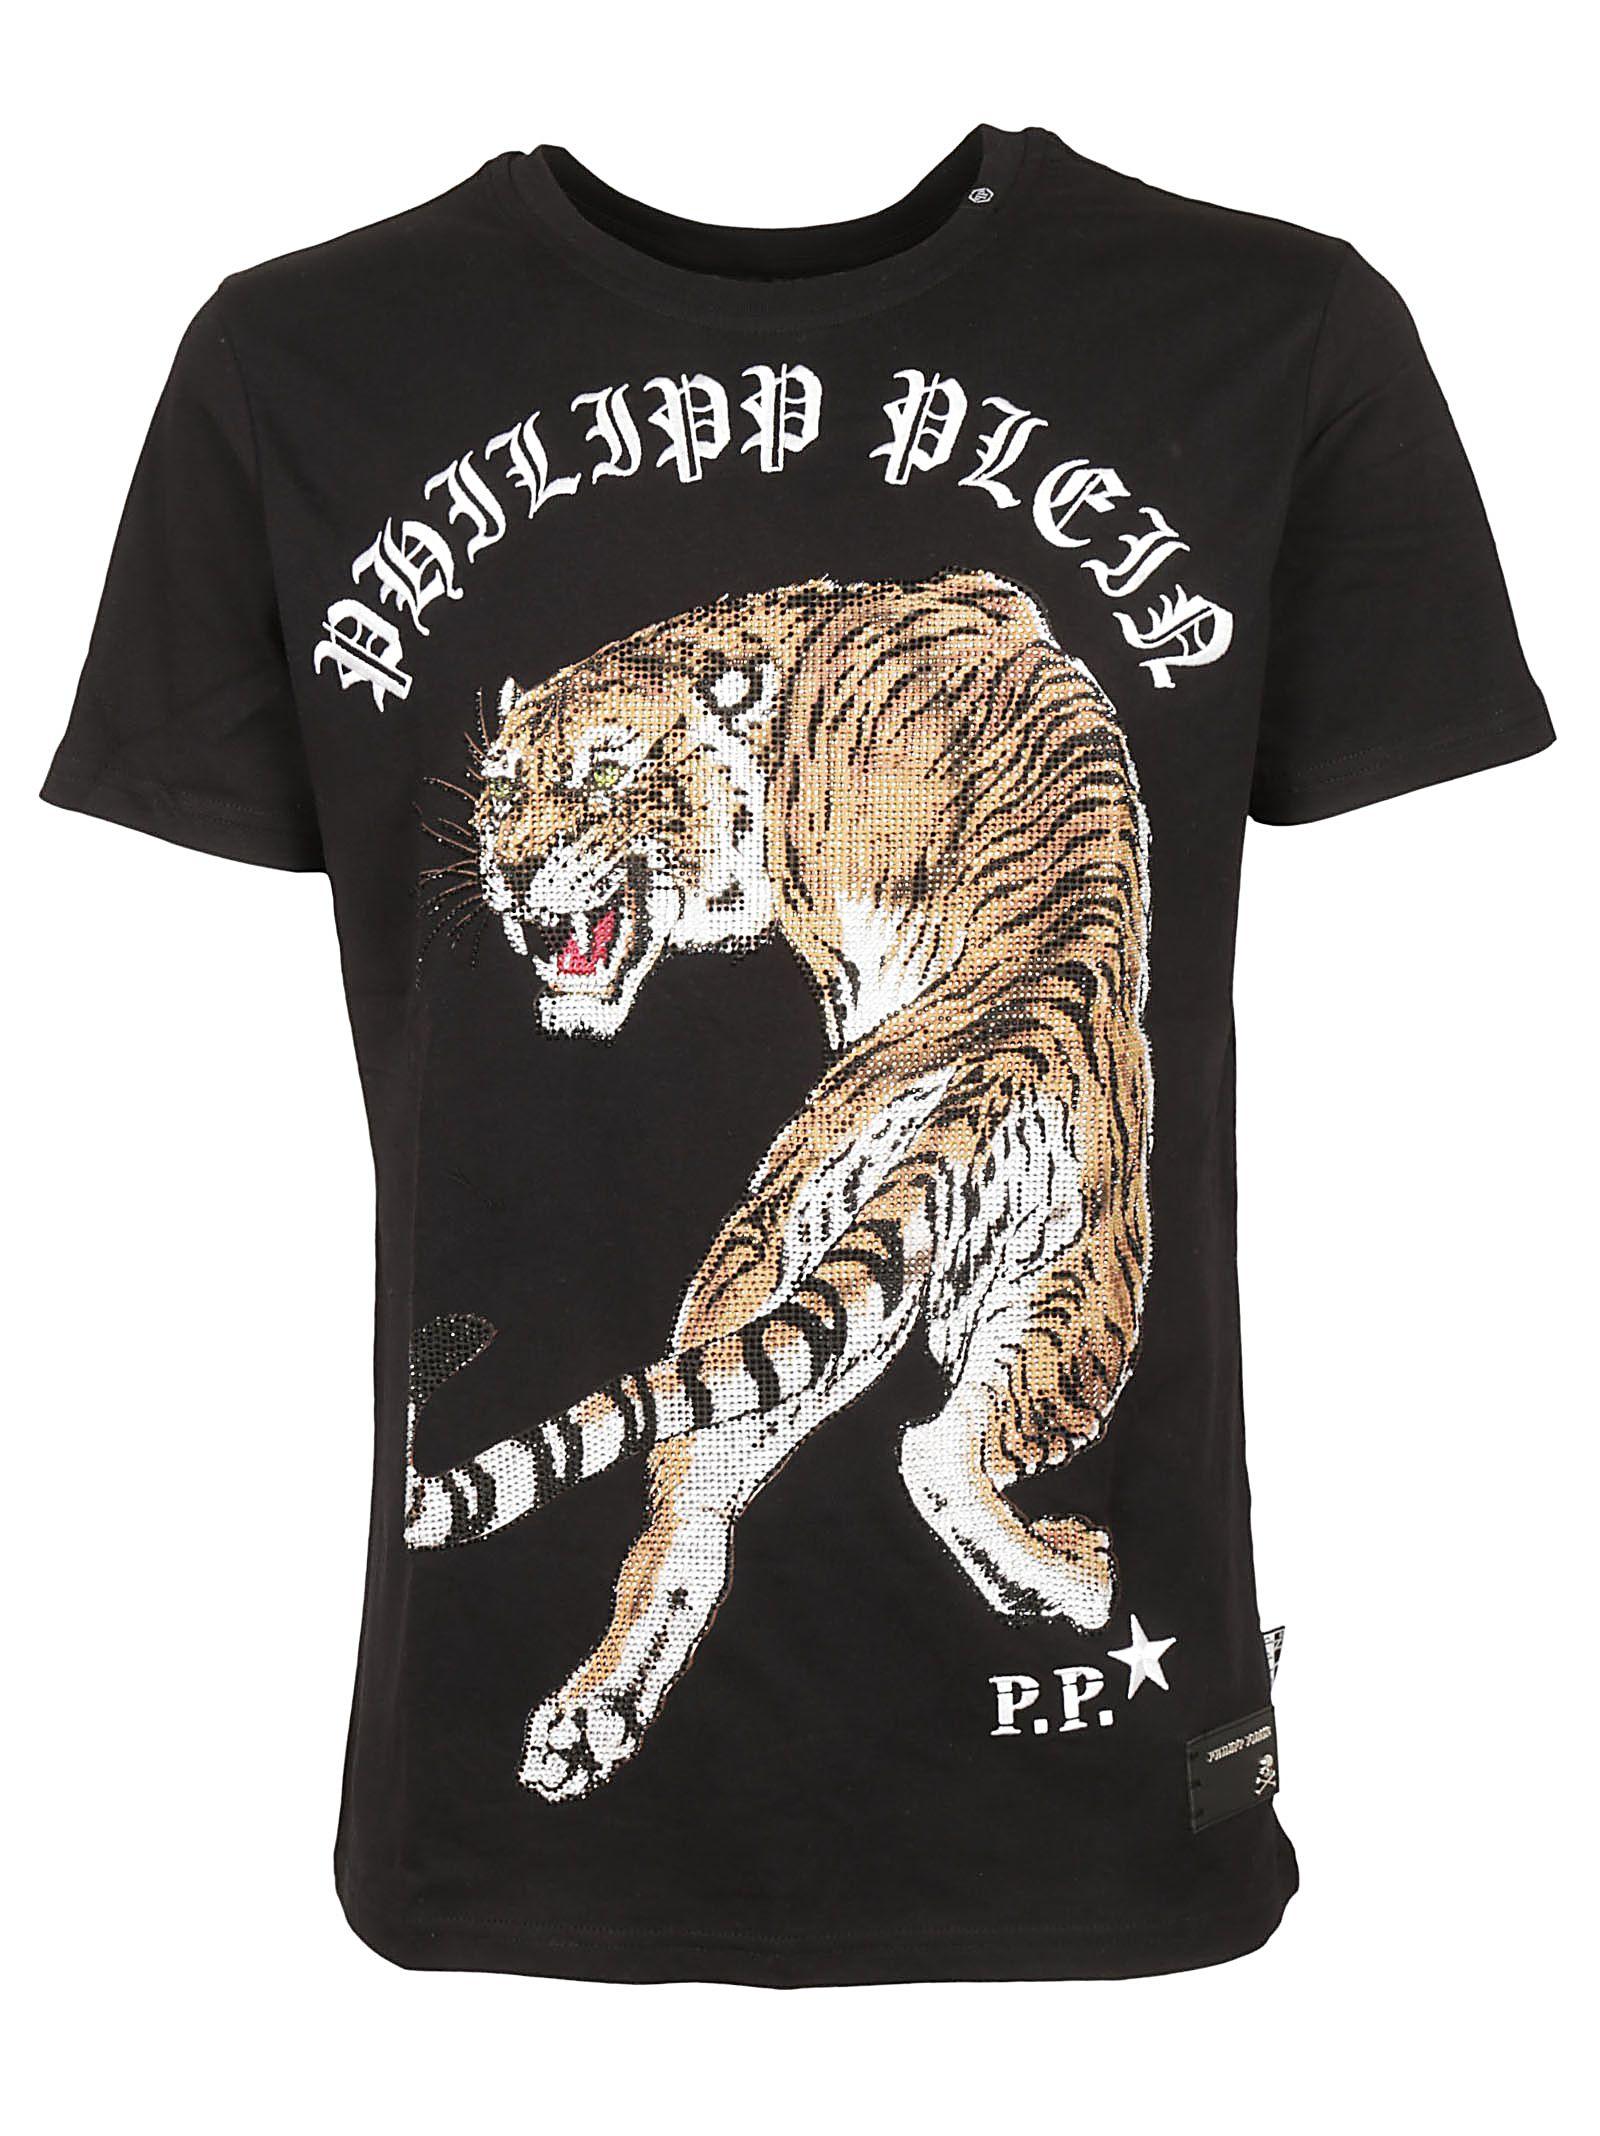 philipp plein philipp plein tiger print t shirt black. Black Bedroom Furniture Sets. Home Design Ideas